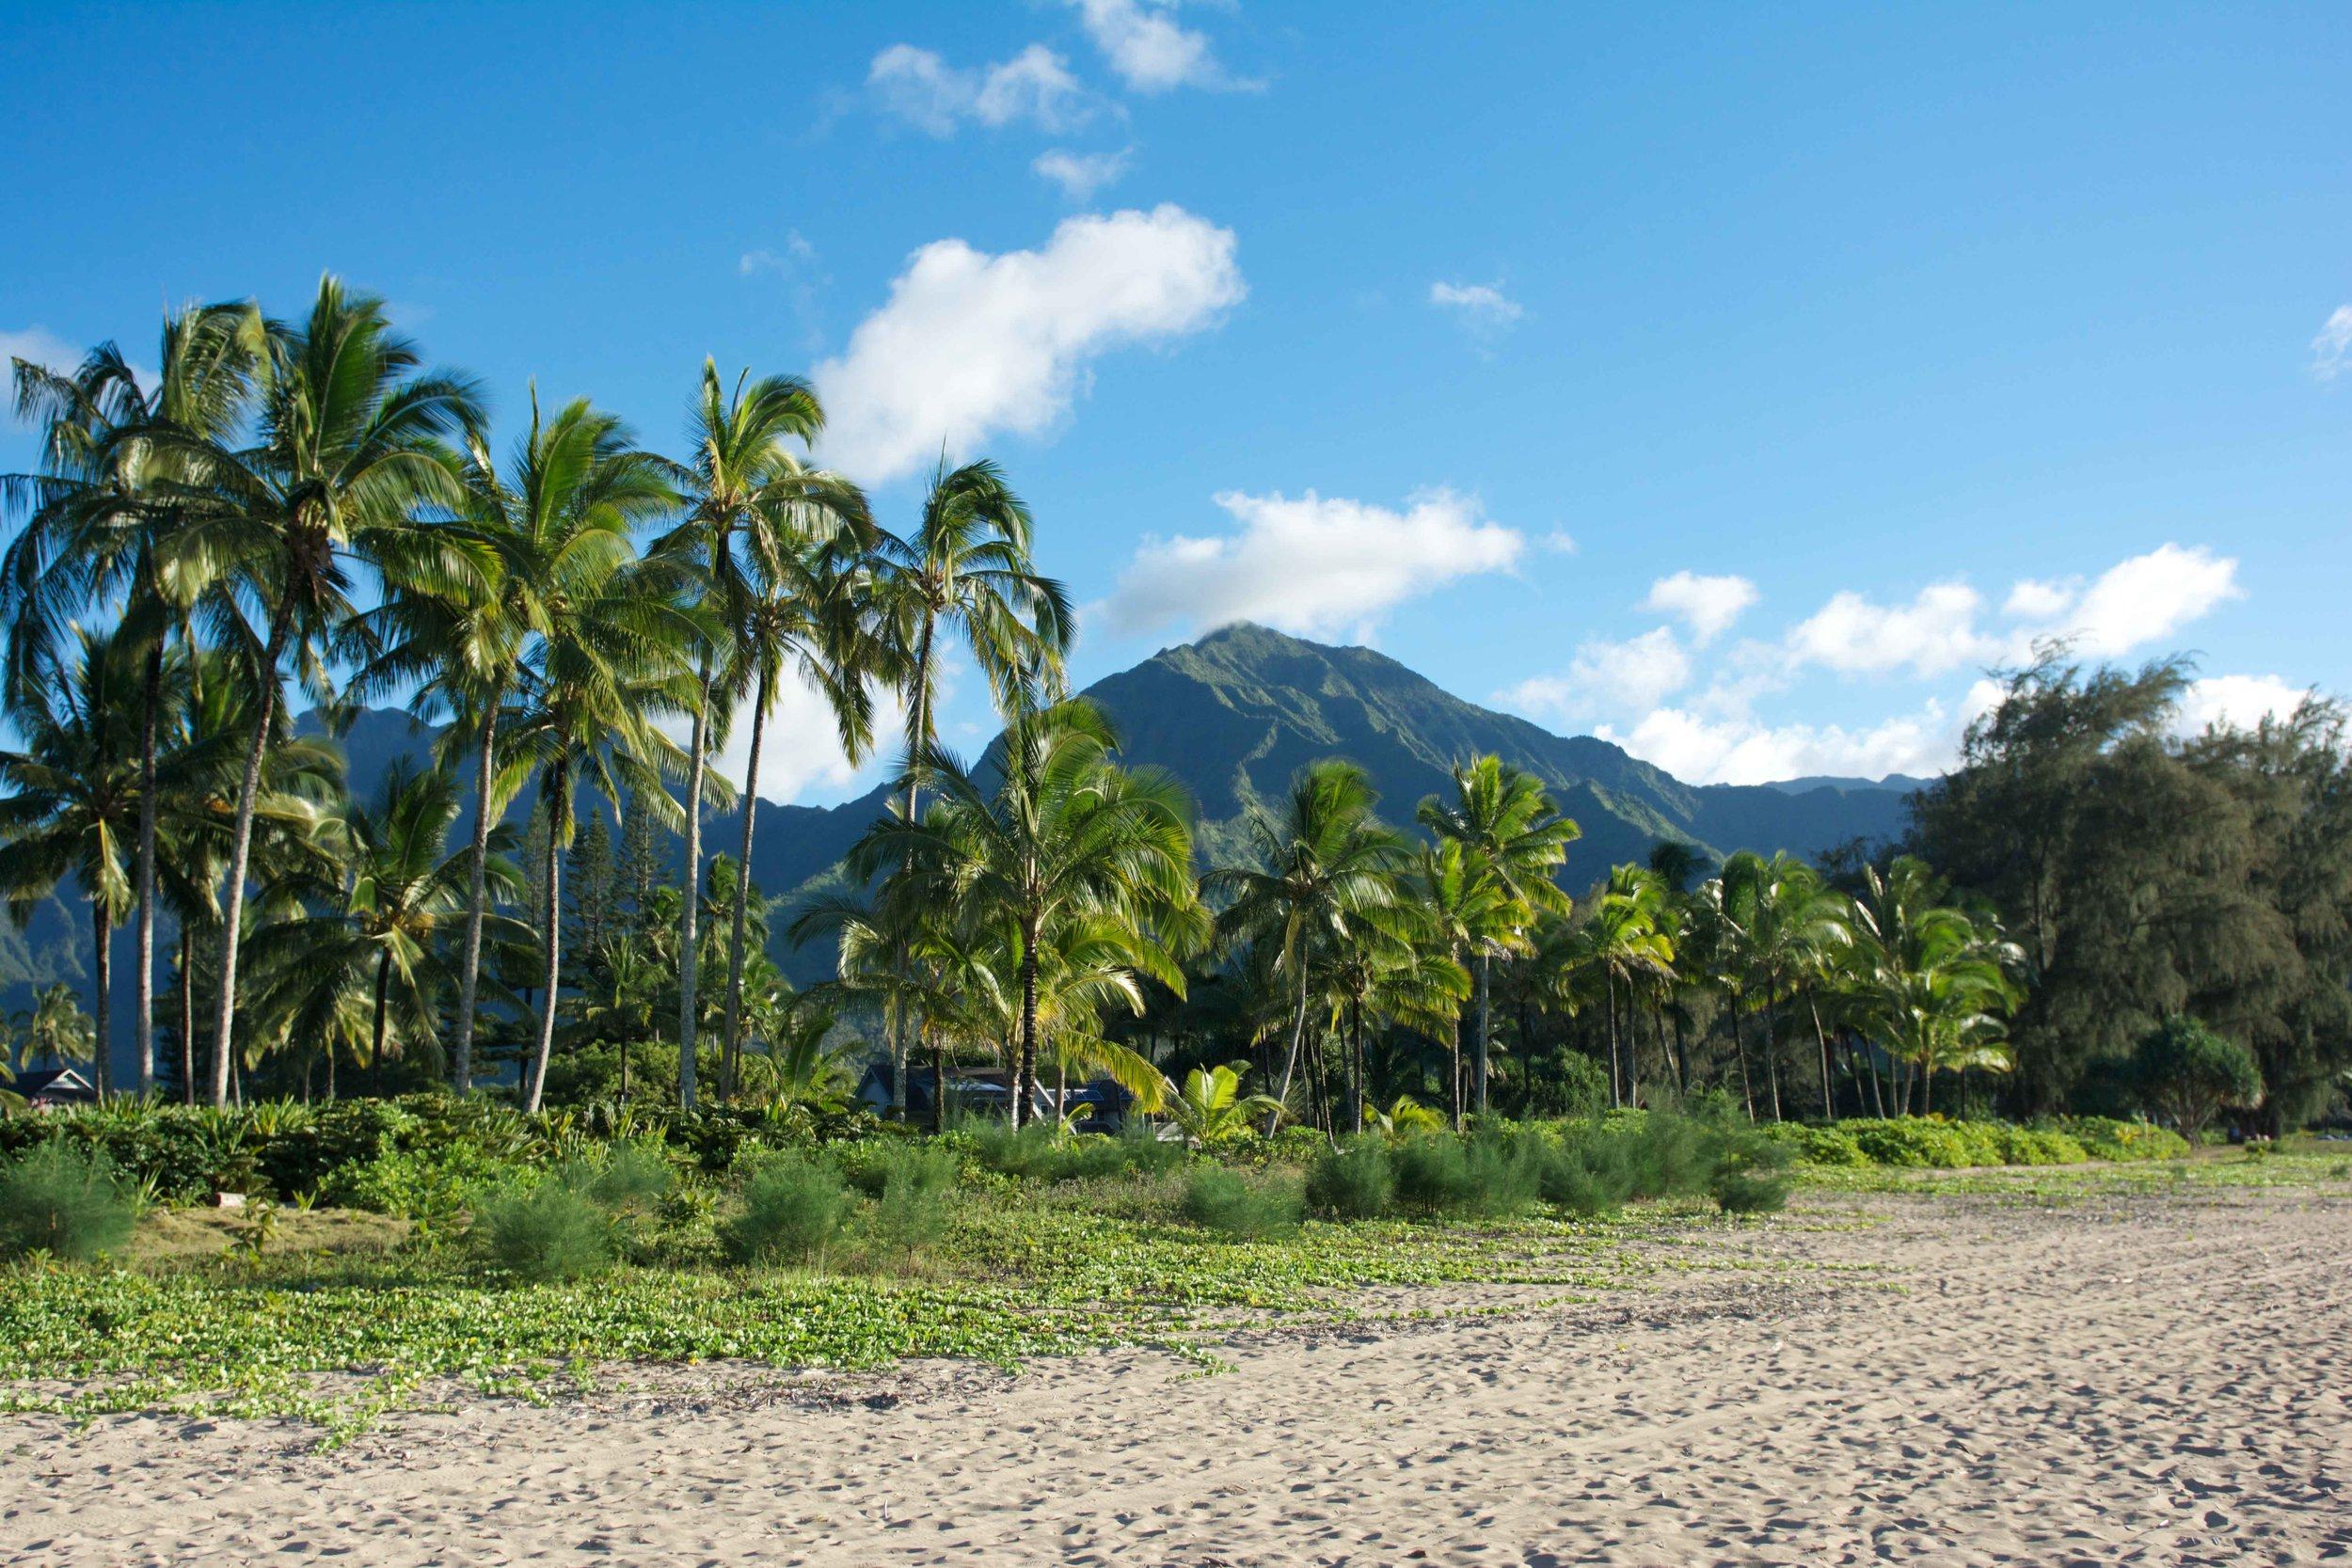 HAWAII VIA TOLILA